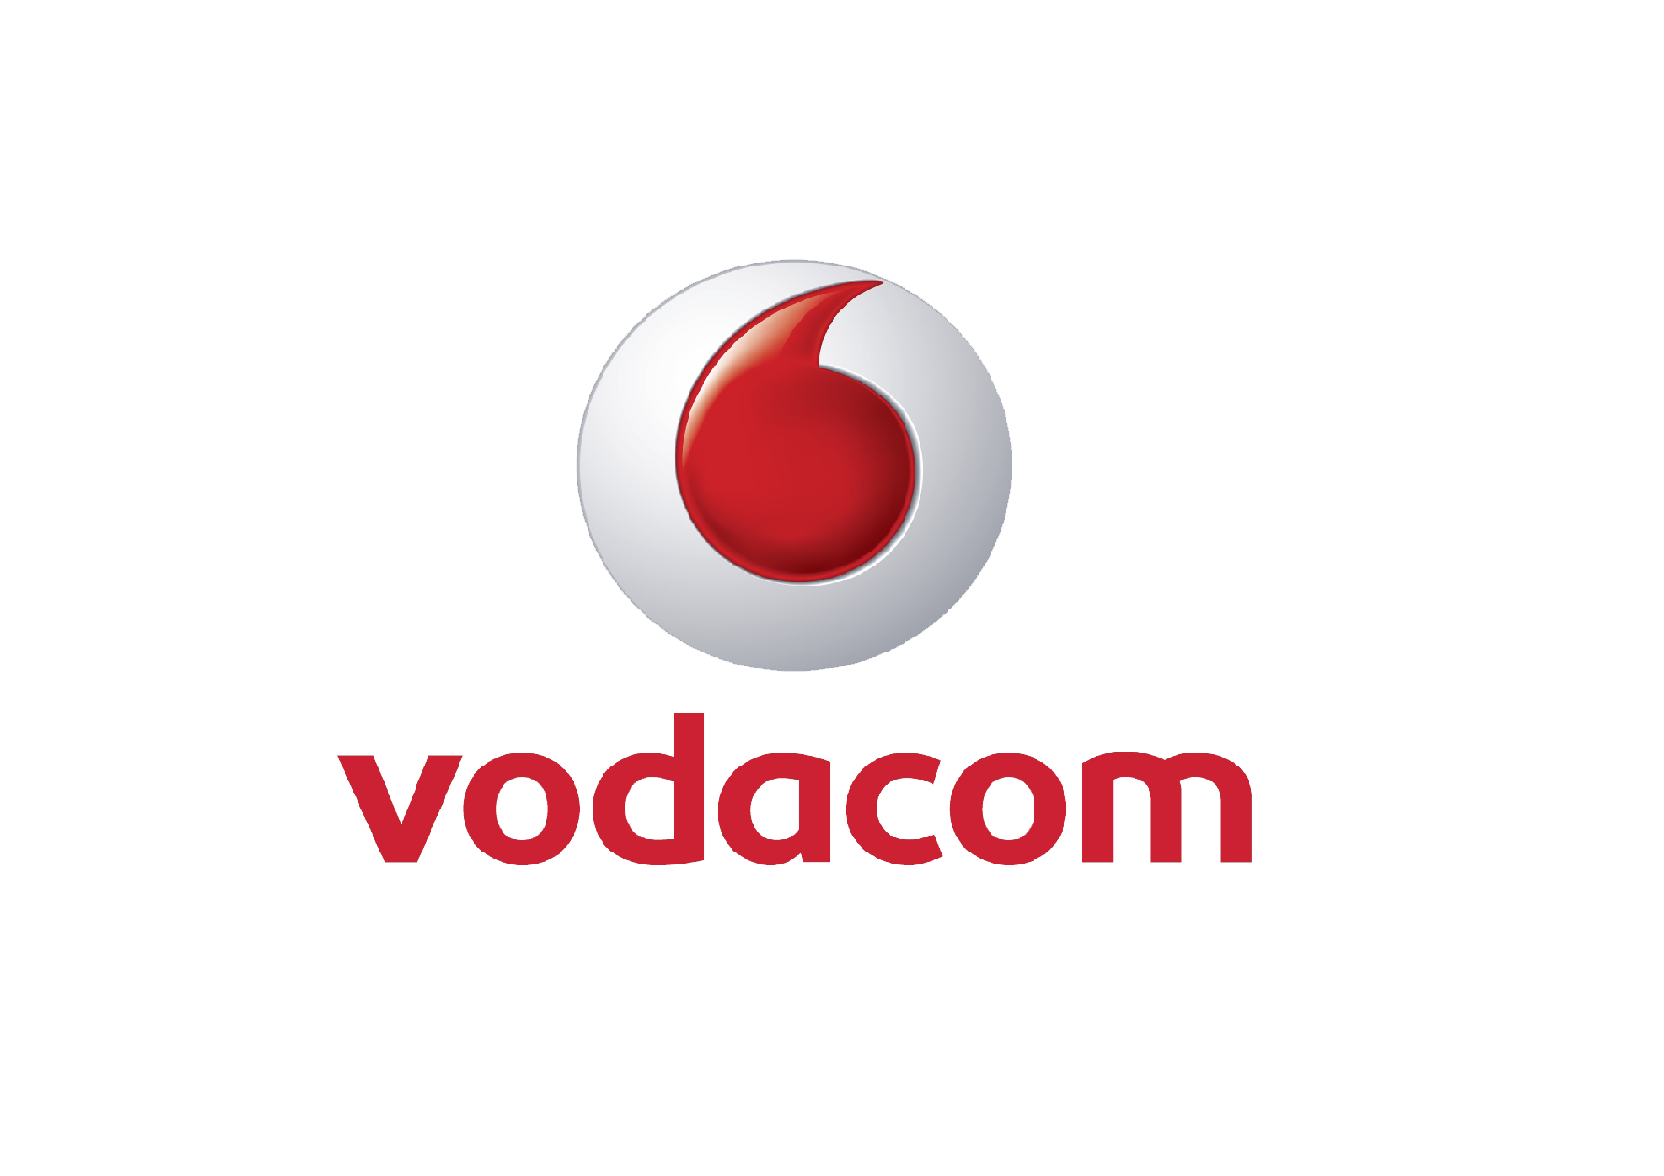 Vodacom logo (carousel)